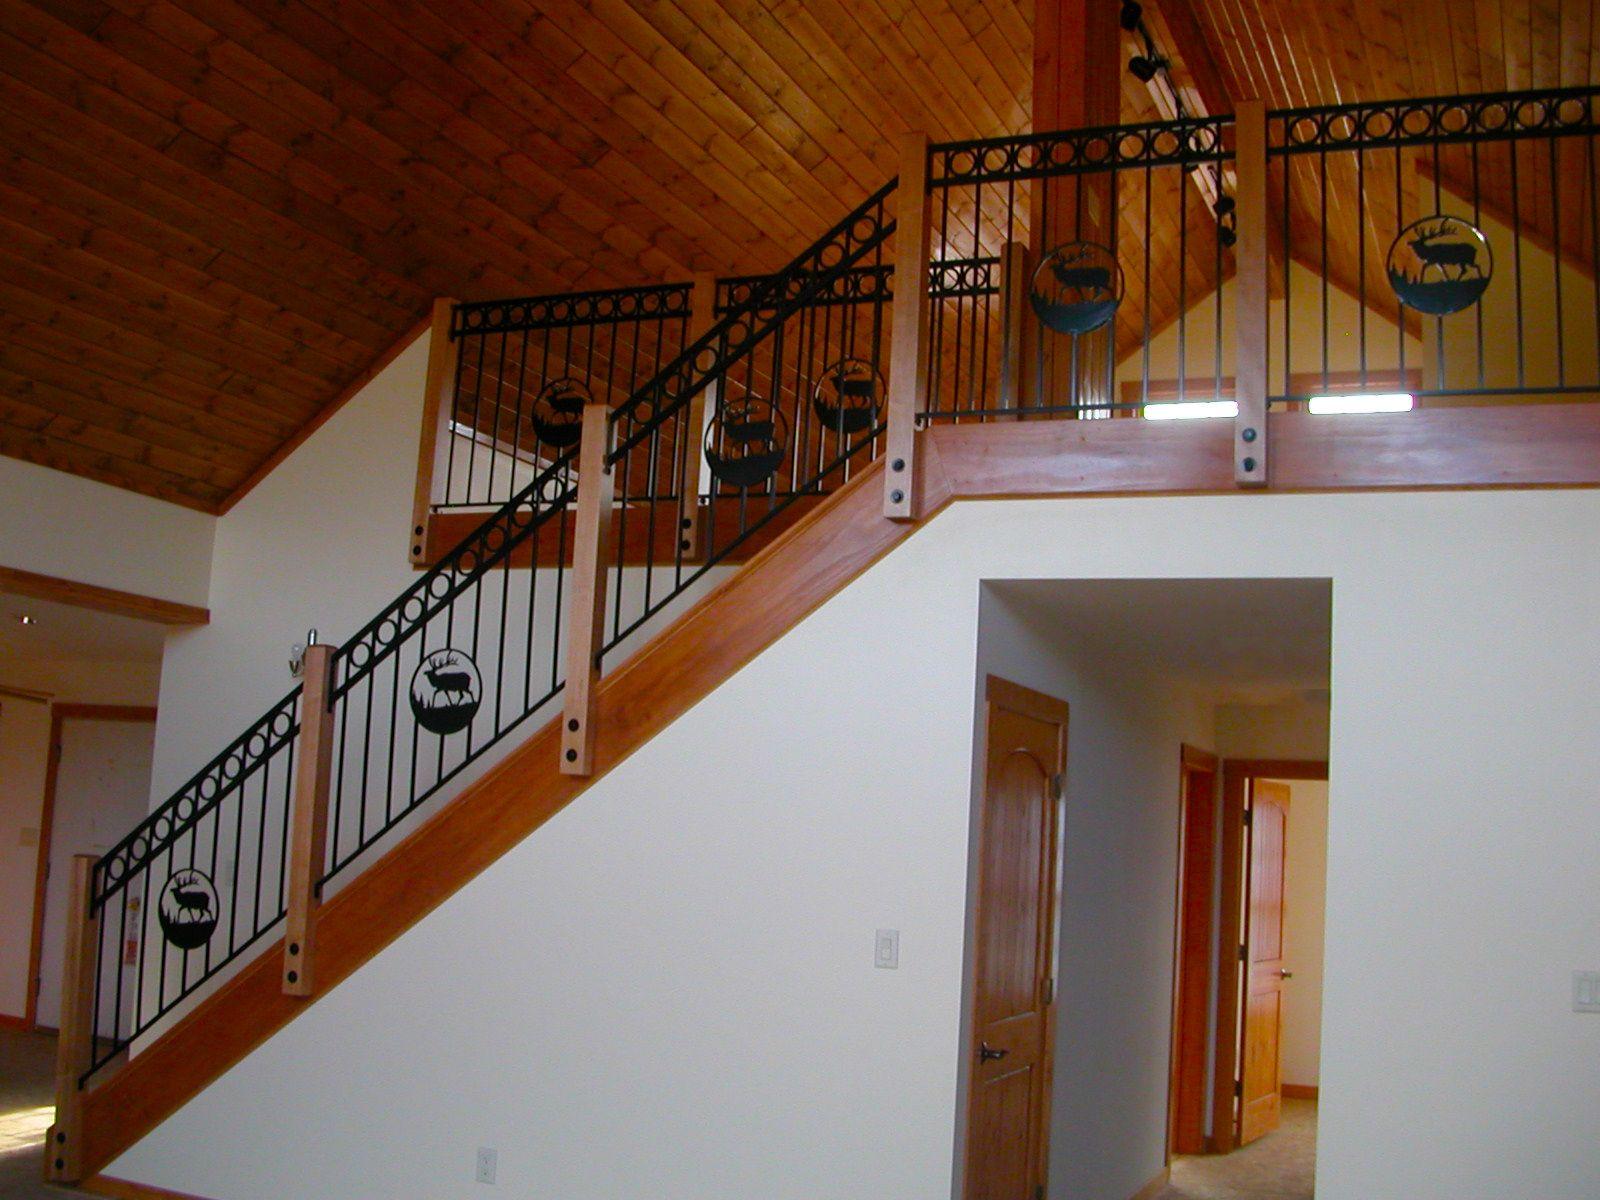 Rustic Mountian Stair Railings: Black Iron Rustic Stair Railing